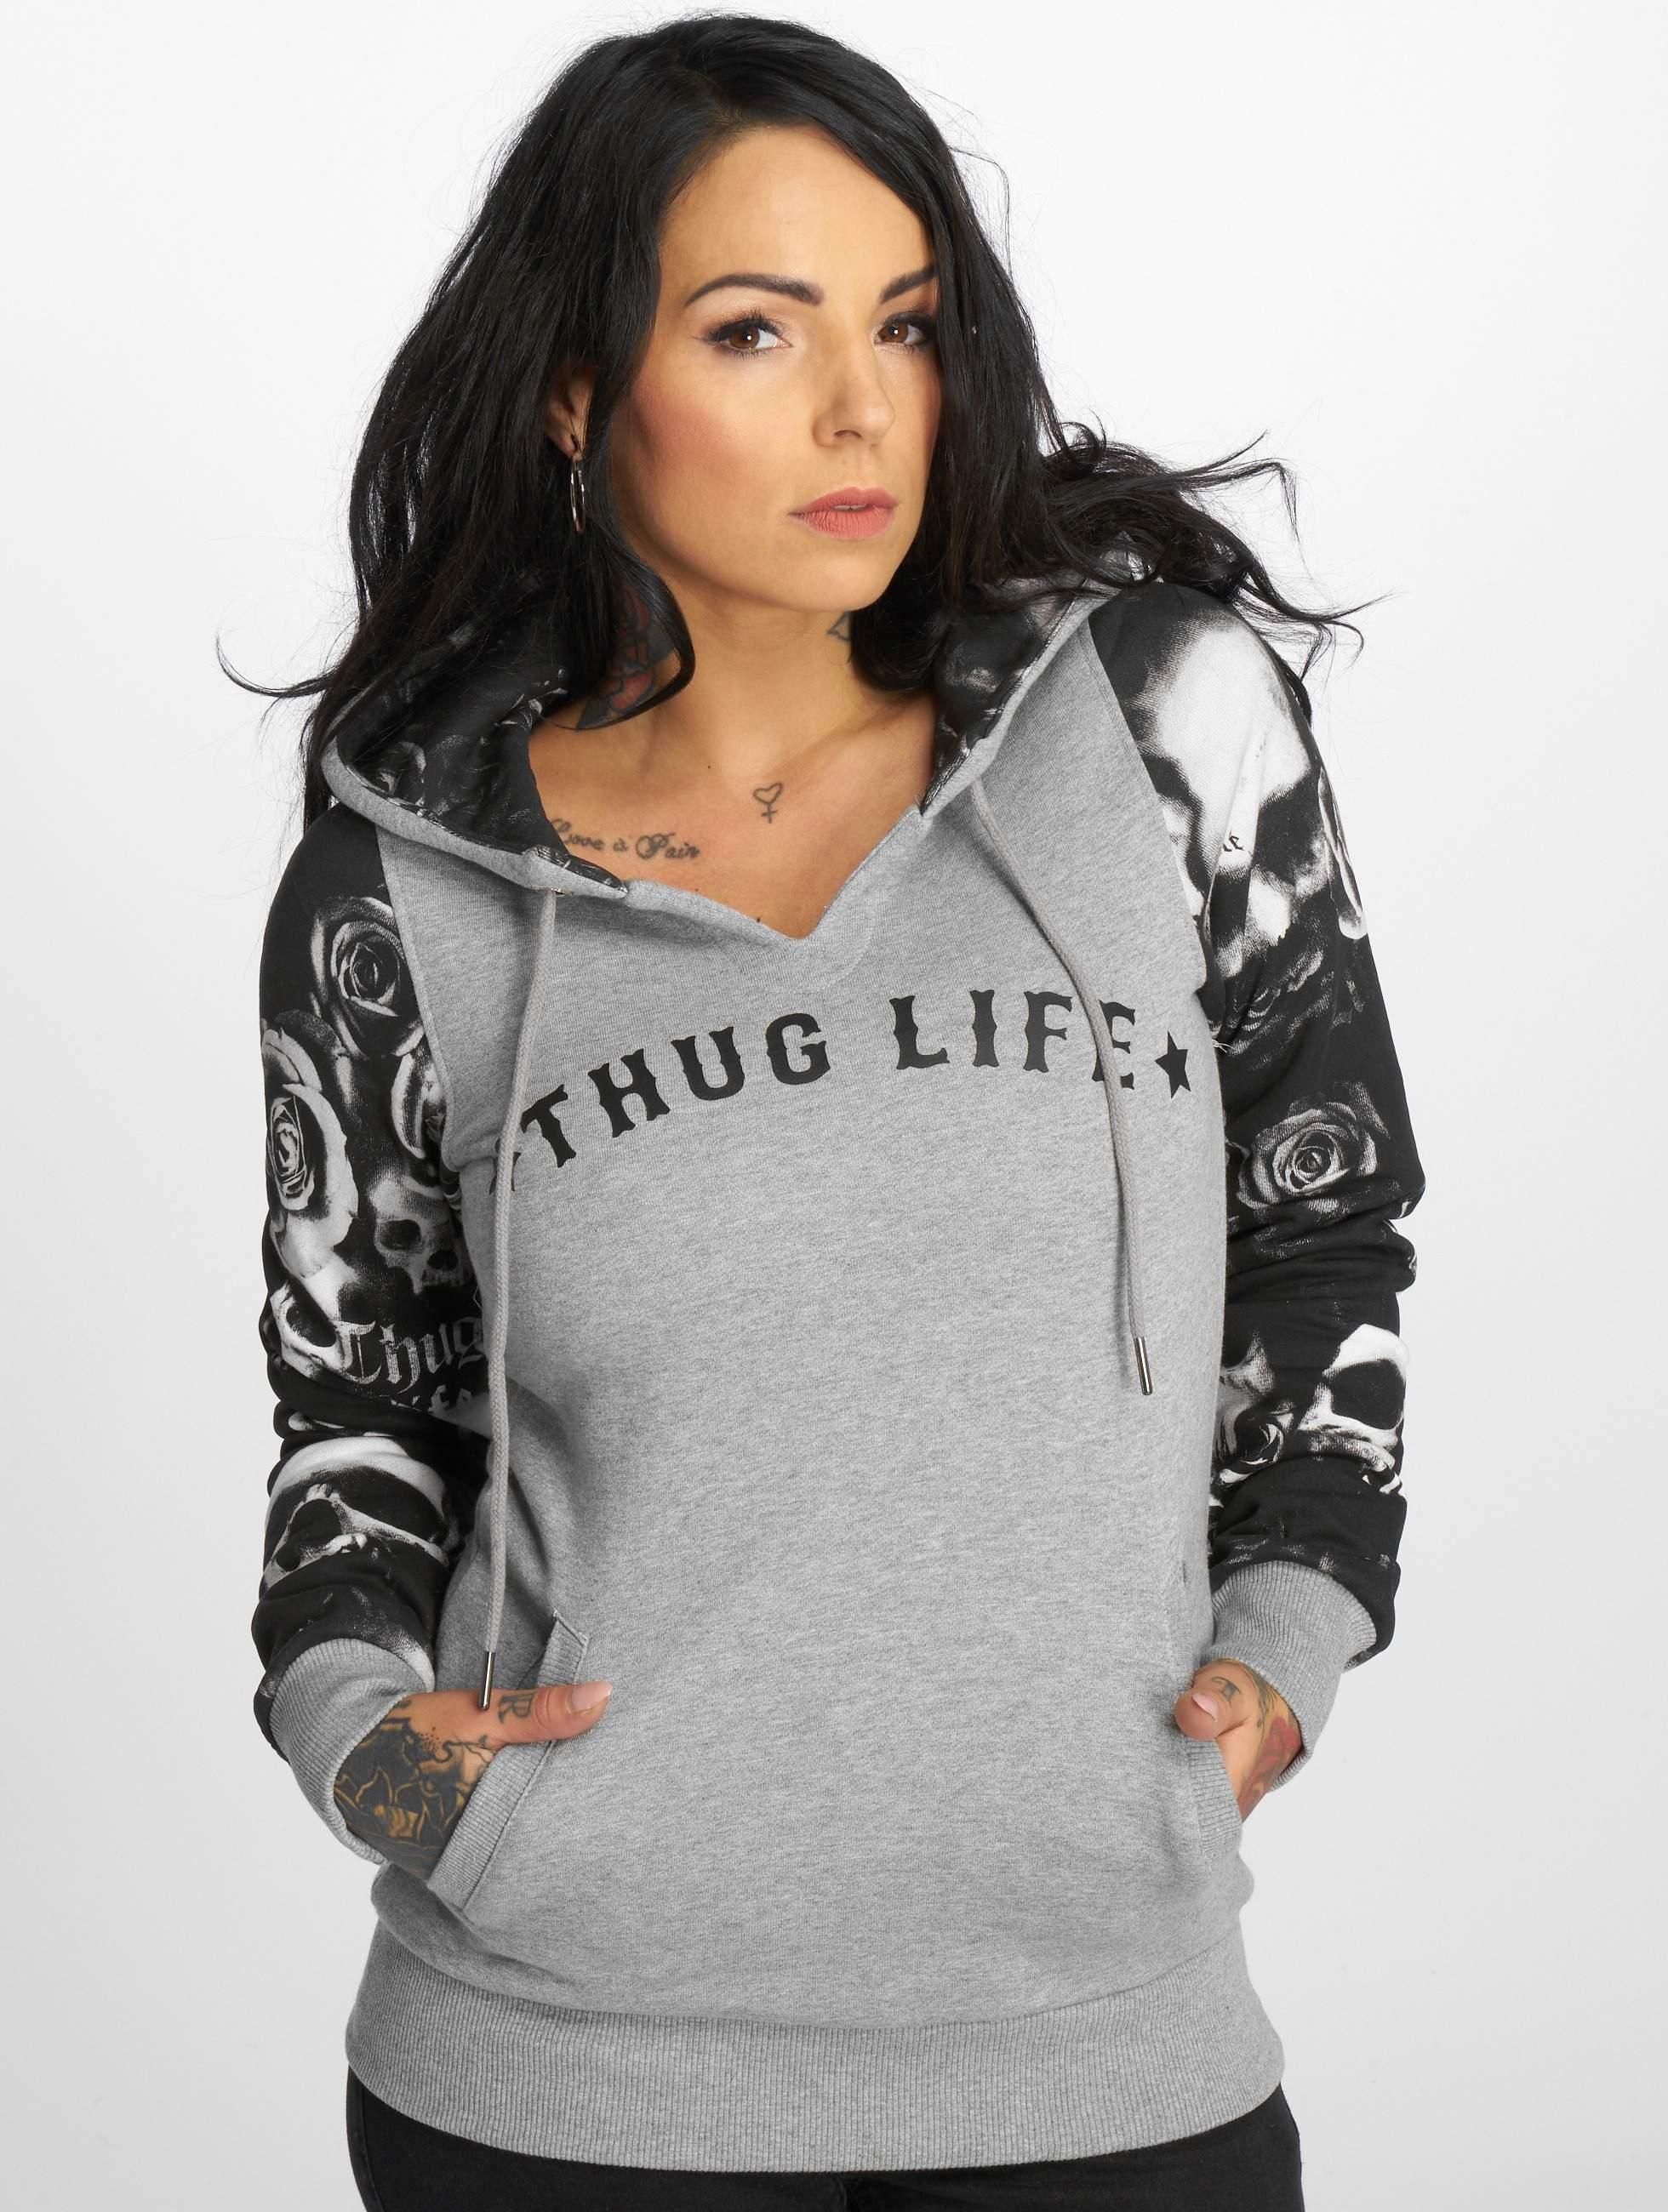 Thug Life / Hoodie Skullpattern in grey XS